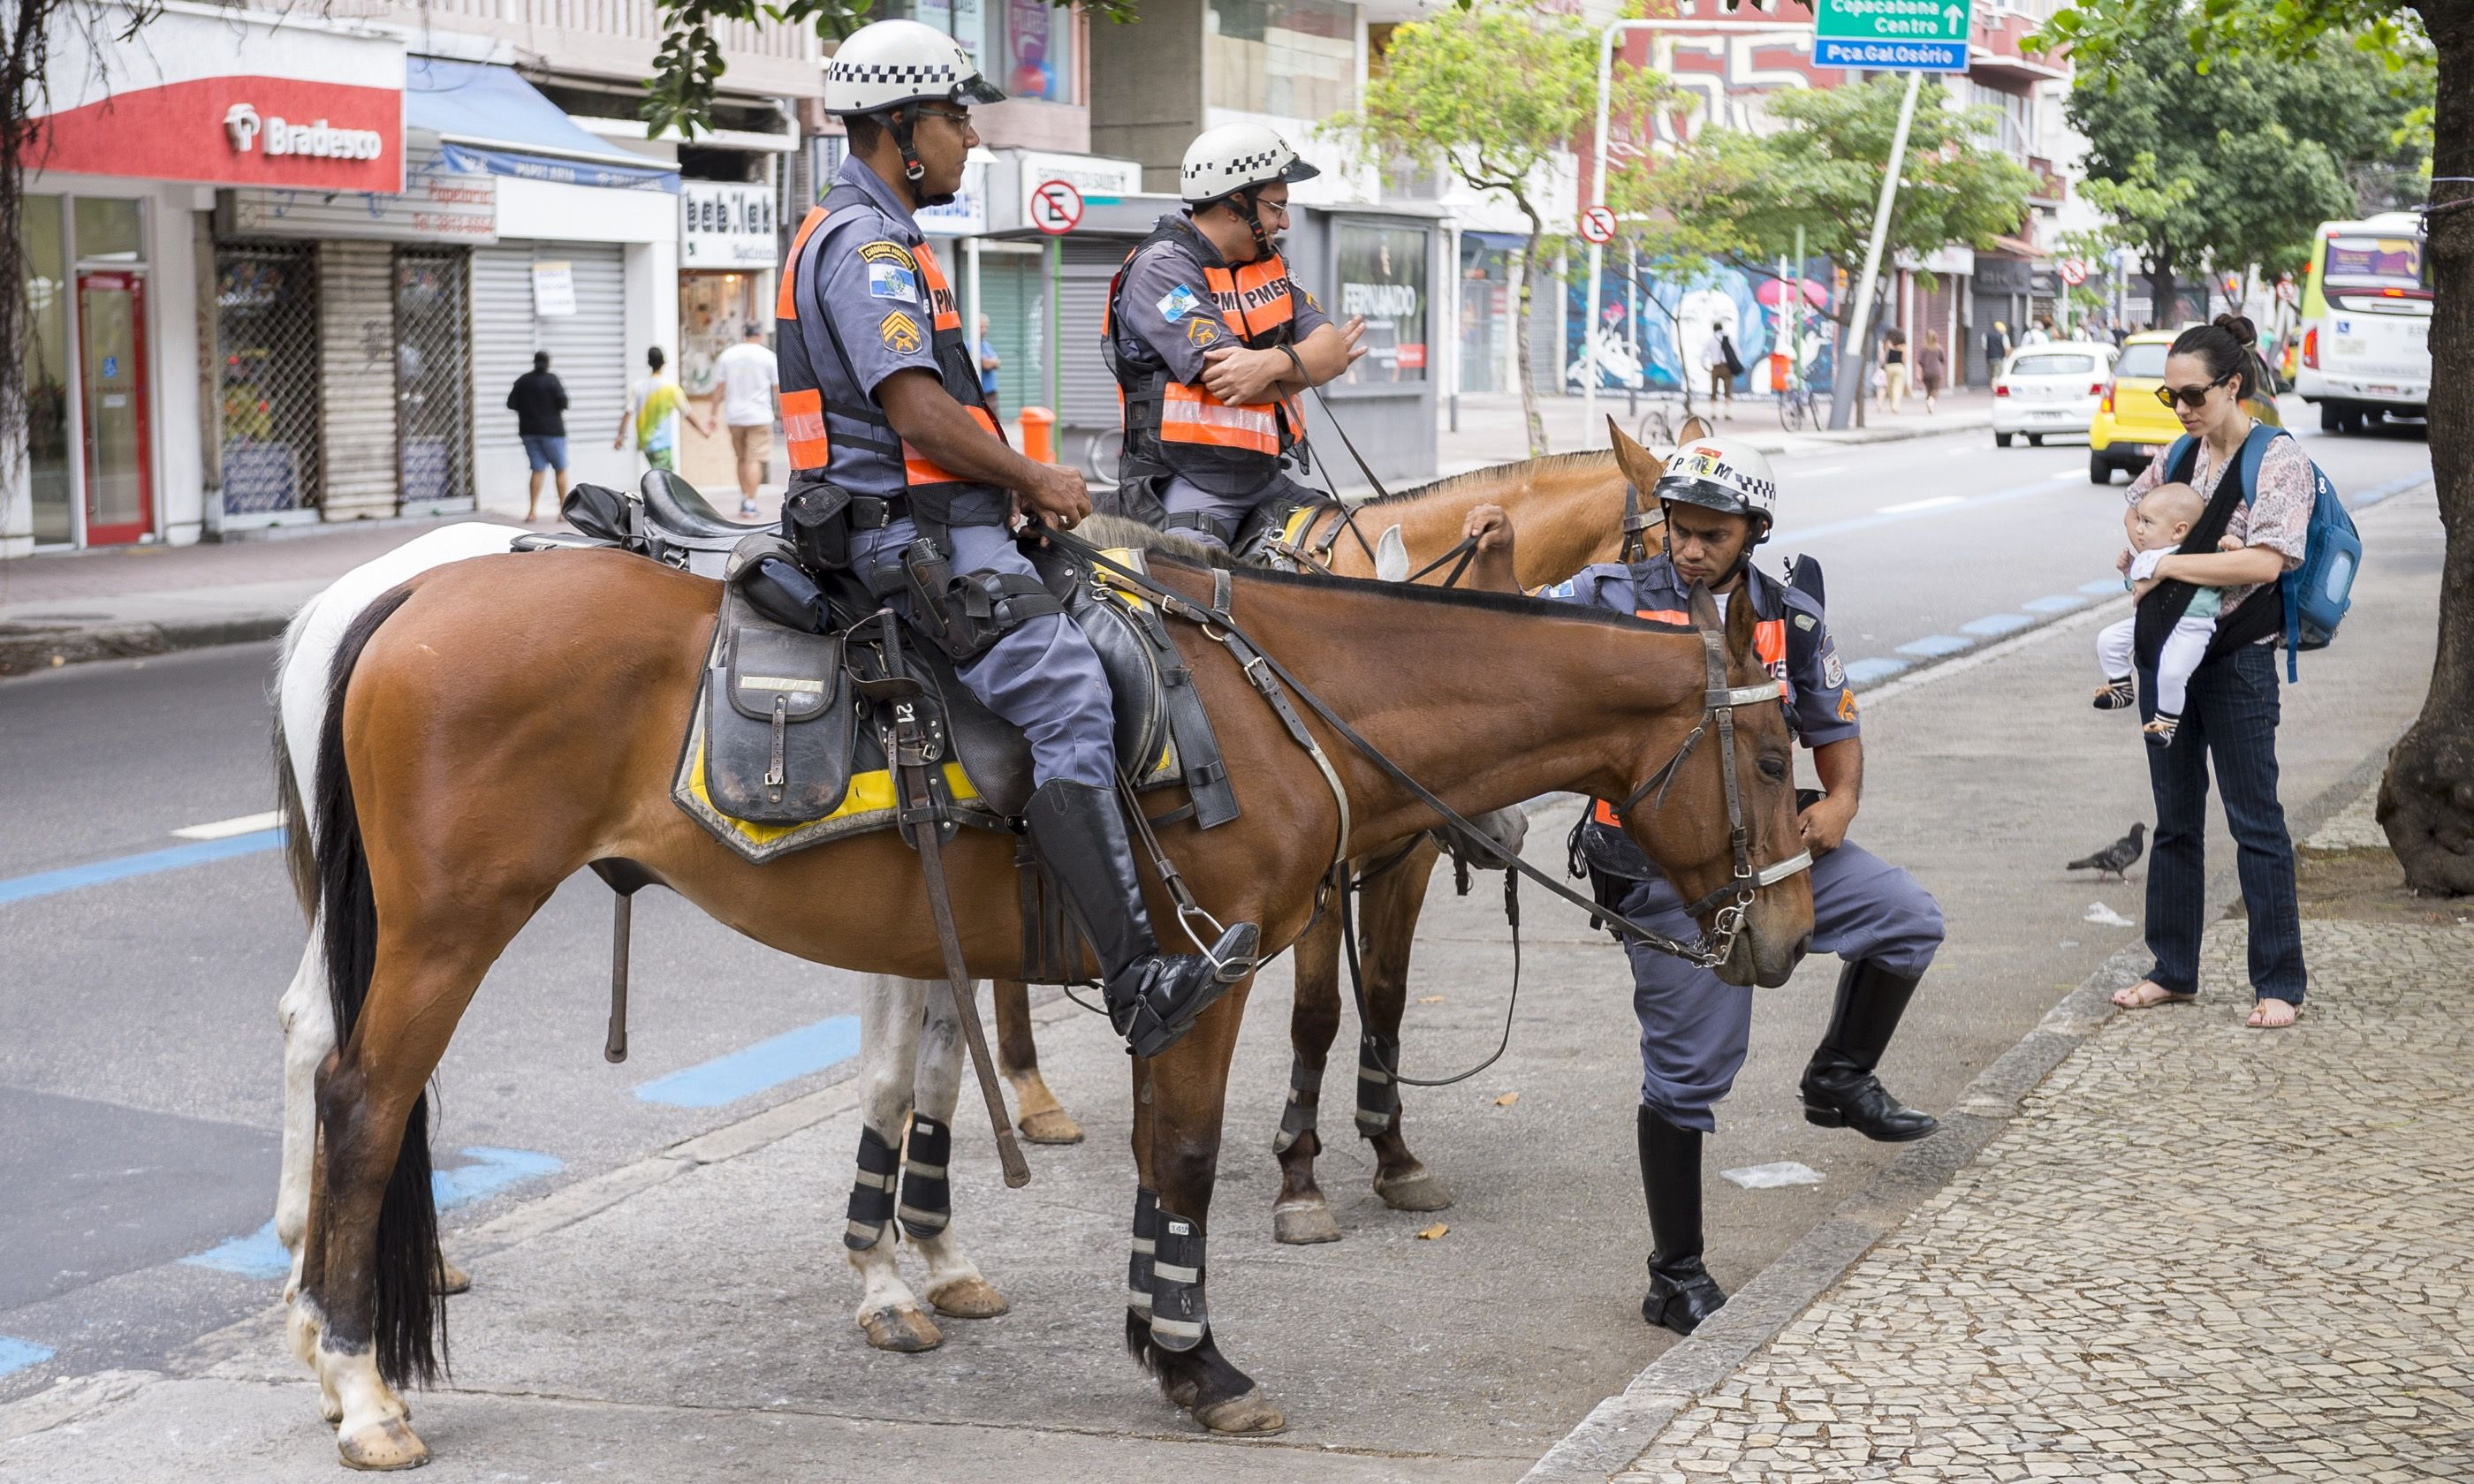 Police horses in Rio (Shutterstock.com)